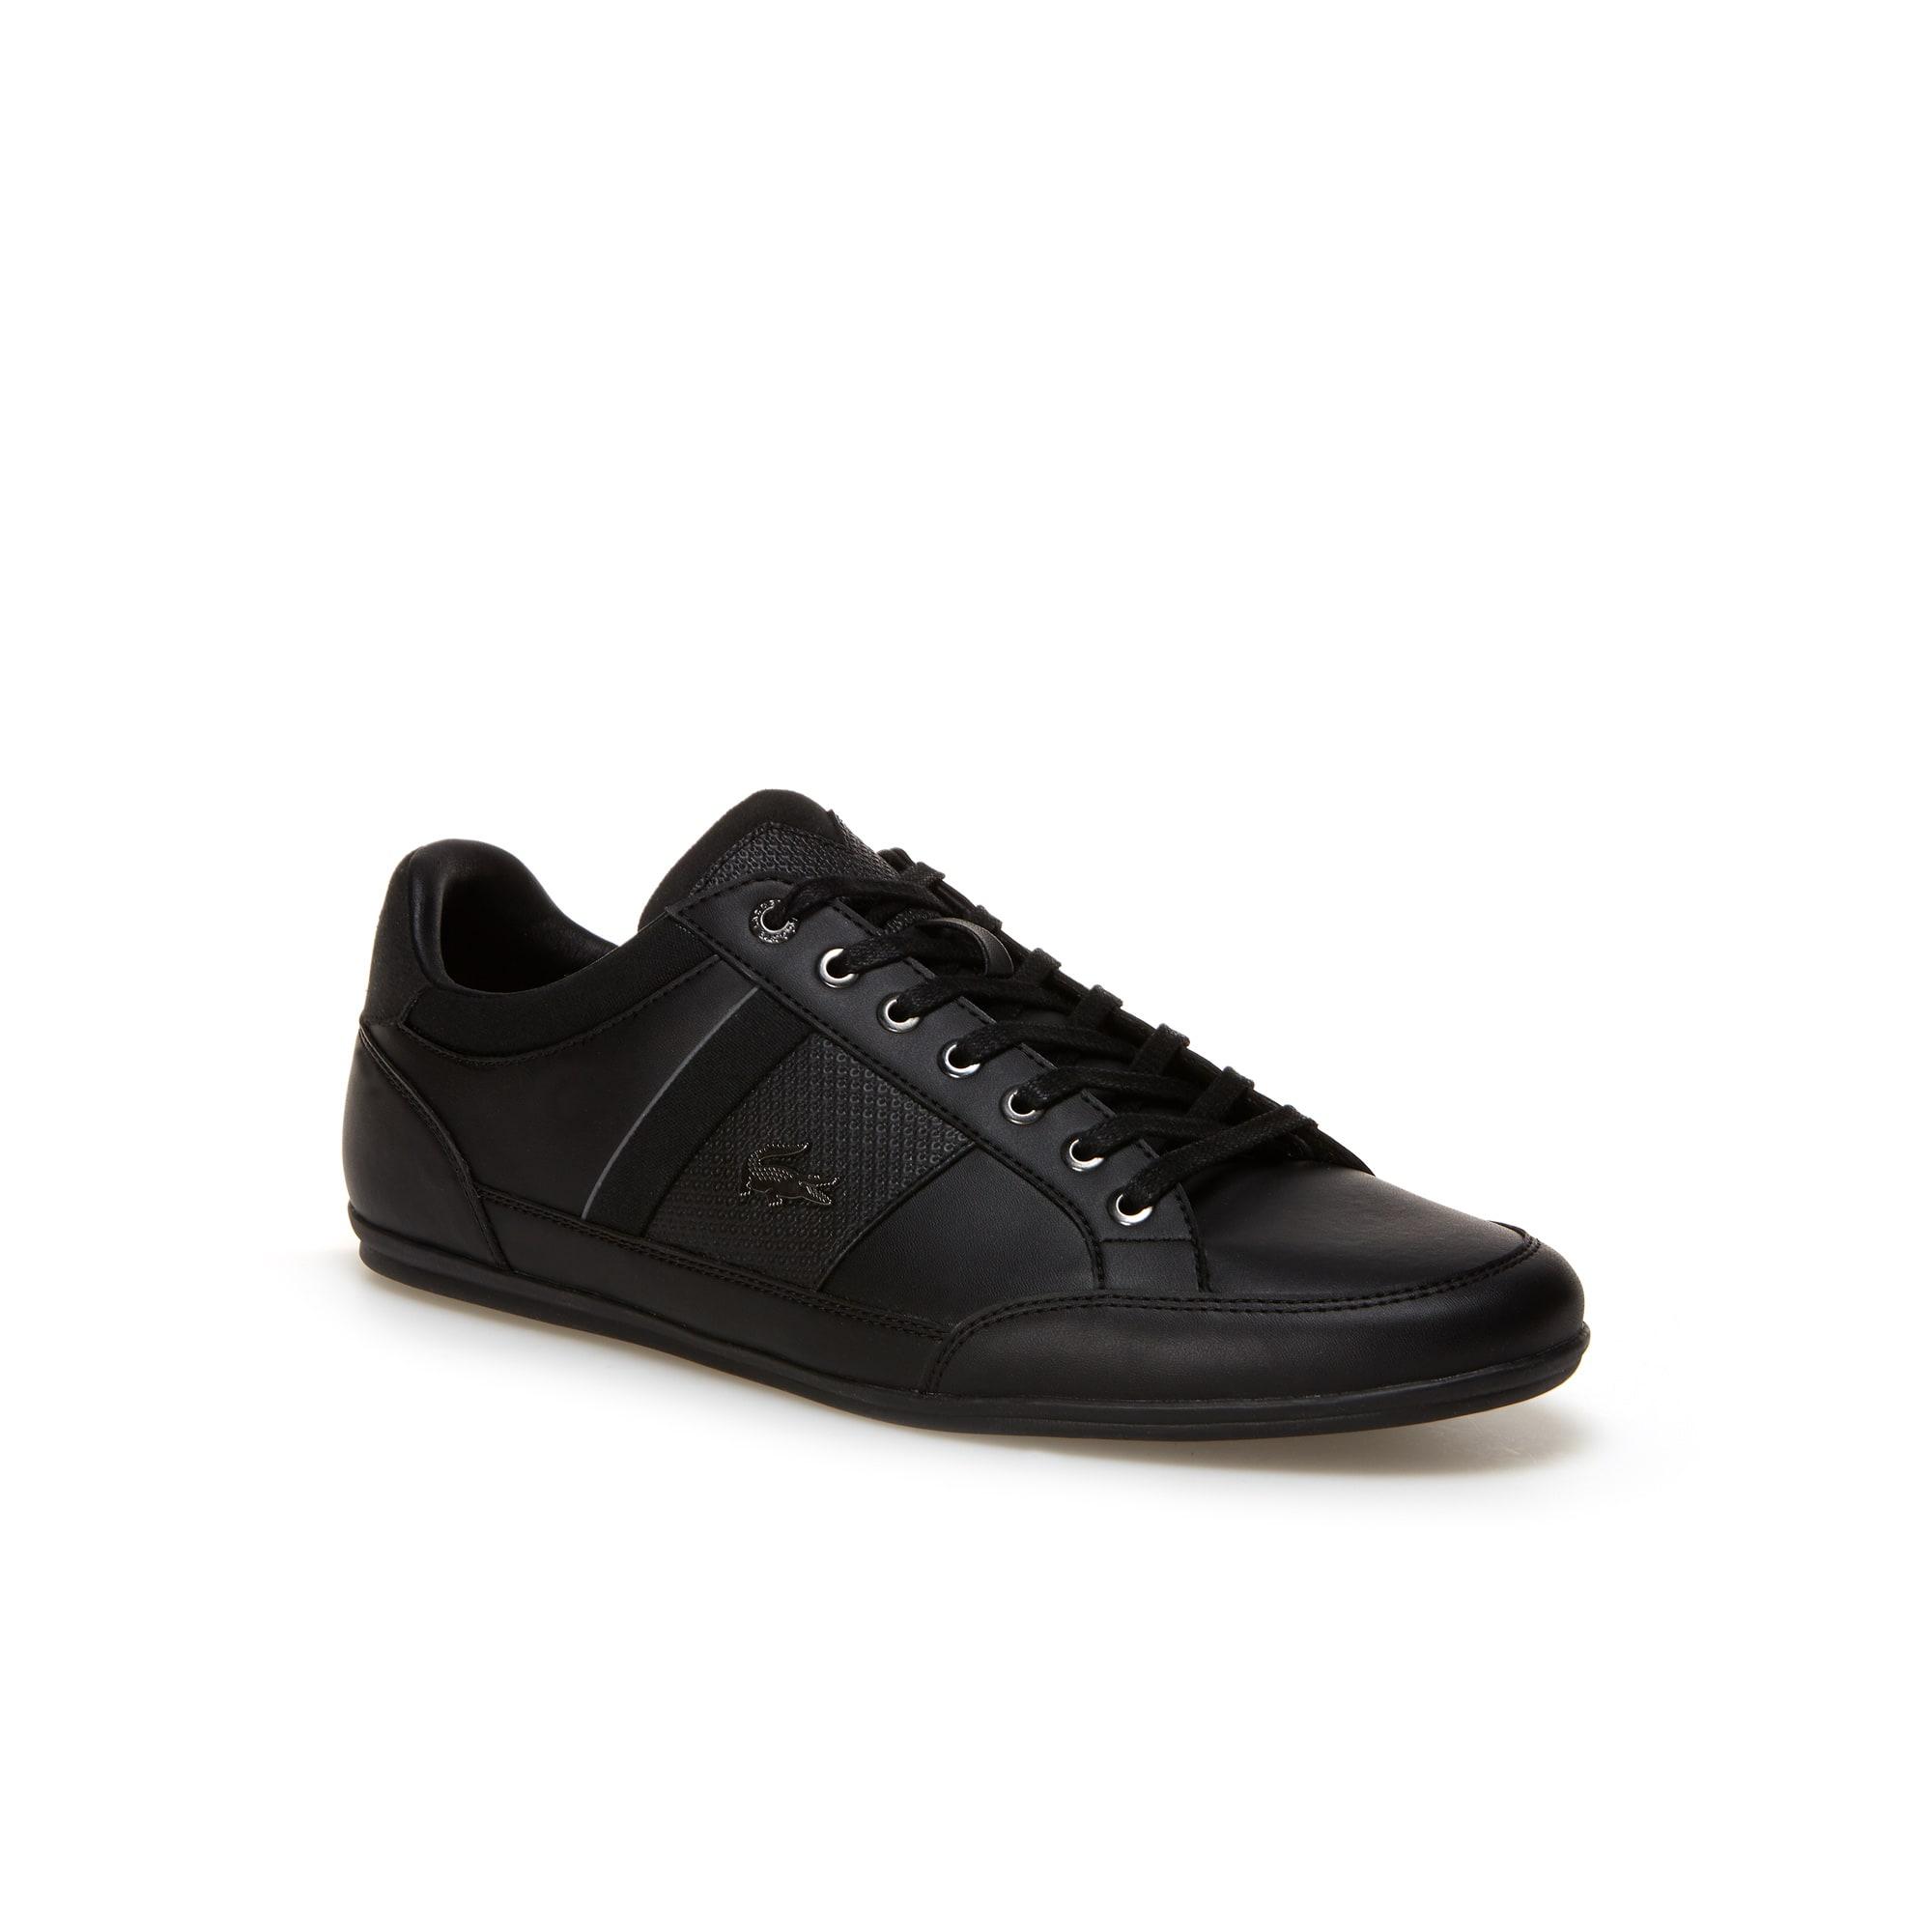 Herren-Sneakers CHAYMON aus Leder